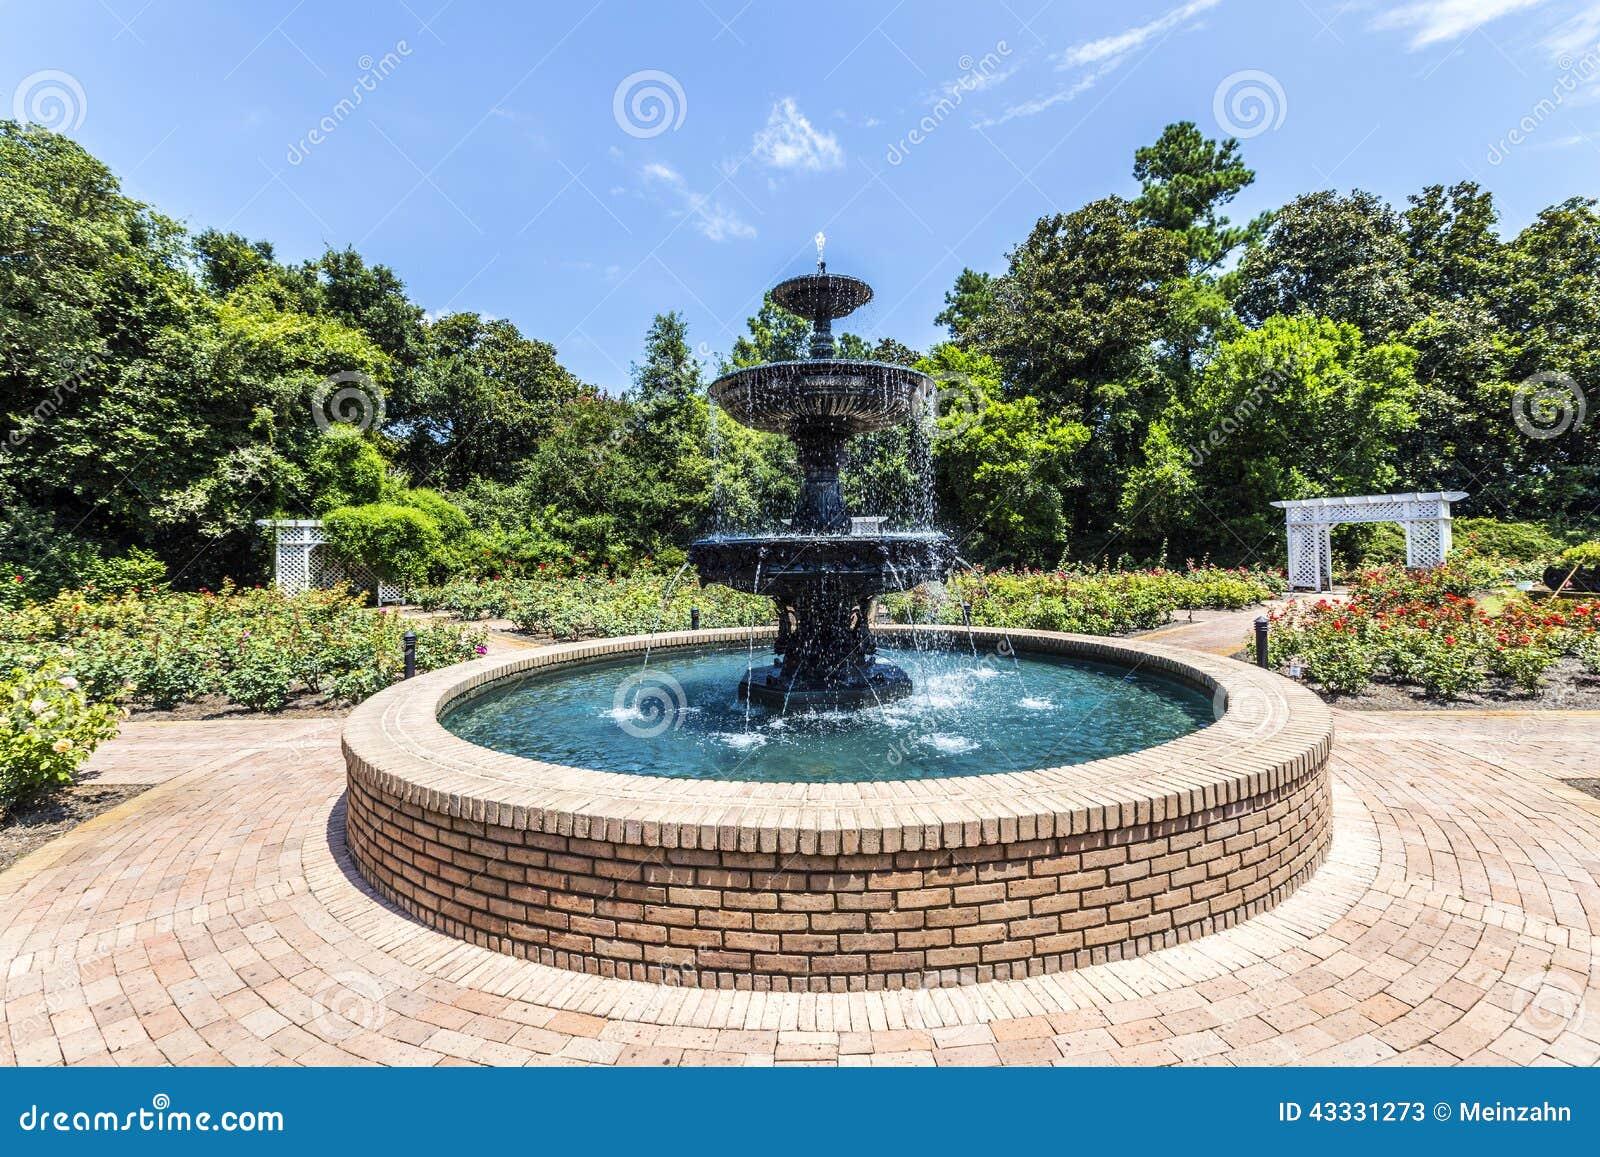 Giardini con fontane fontane giardino with giardini con - Giardini con fontane ...